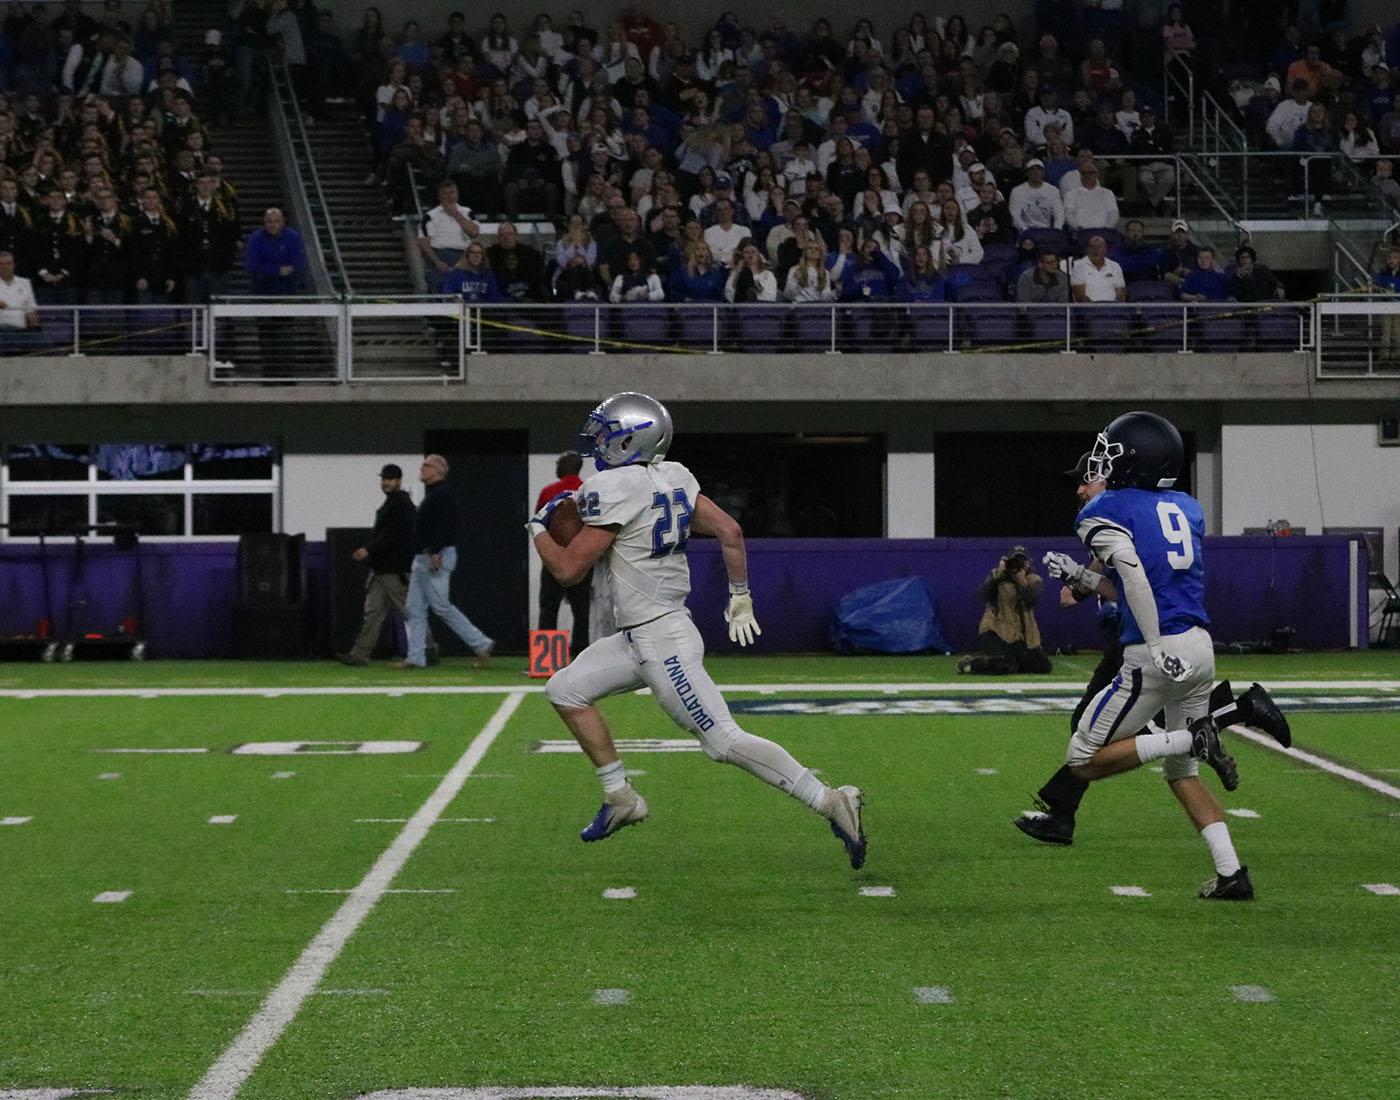 Jason+Williamson+breaks+away+for+a+touchdown